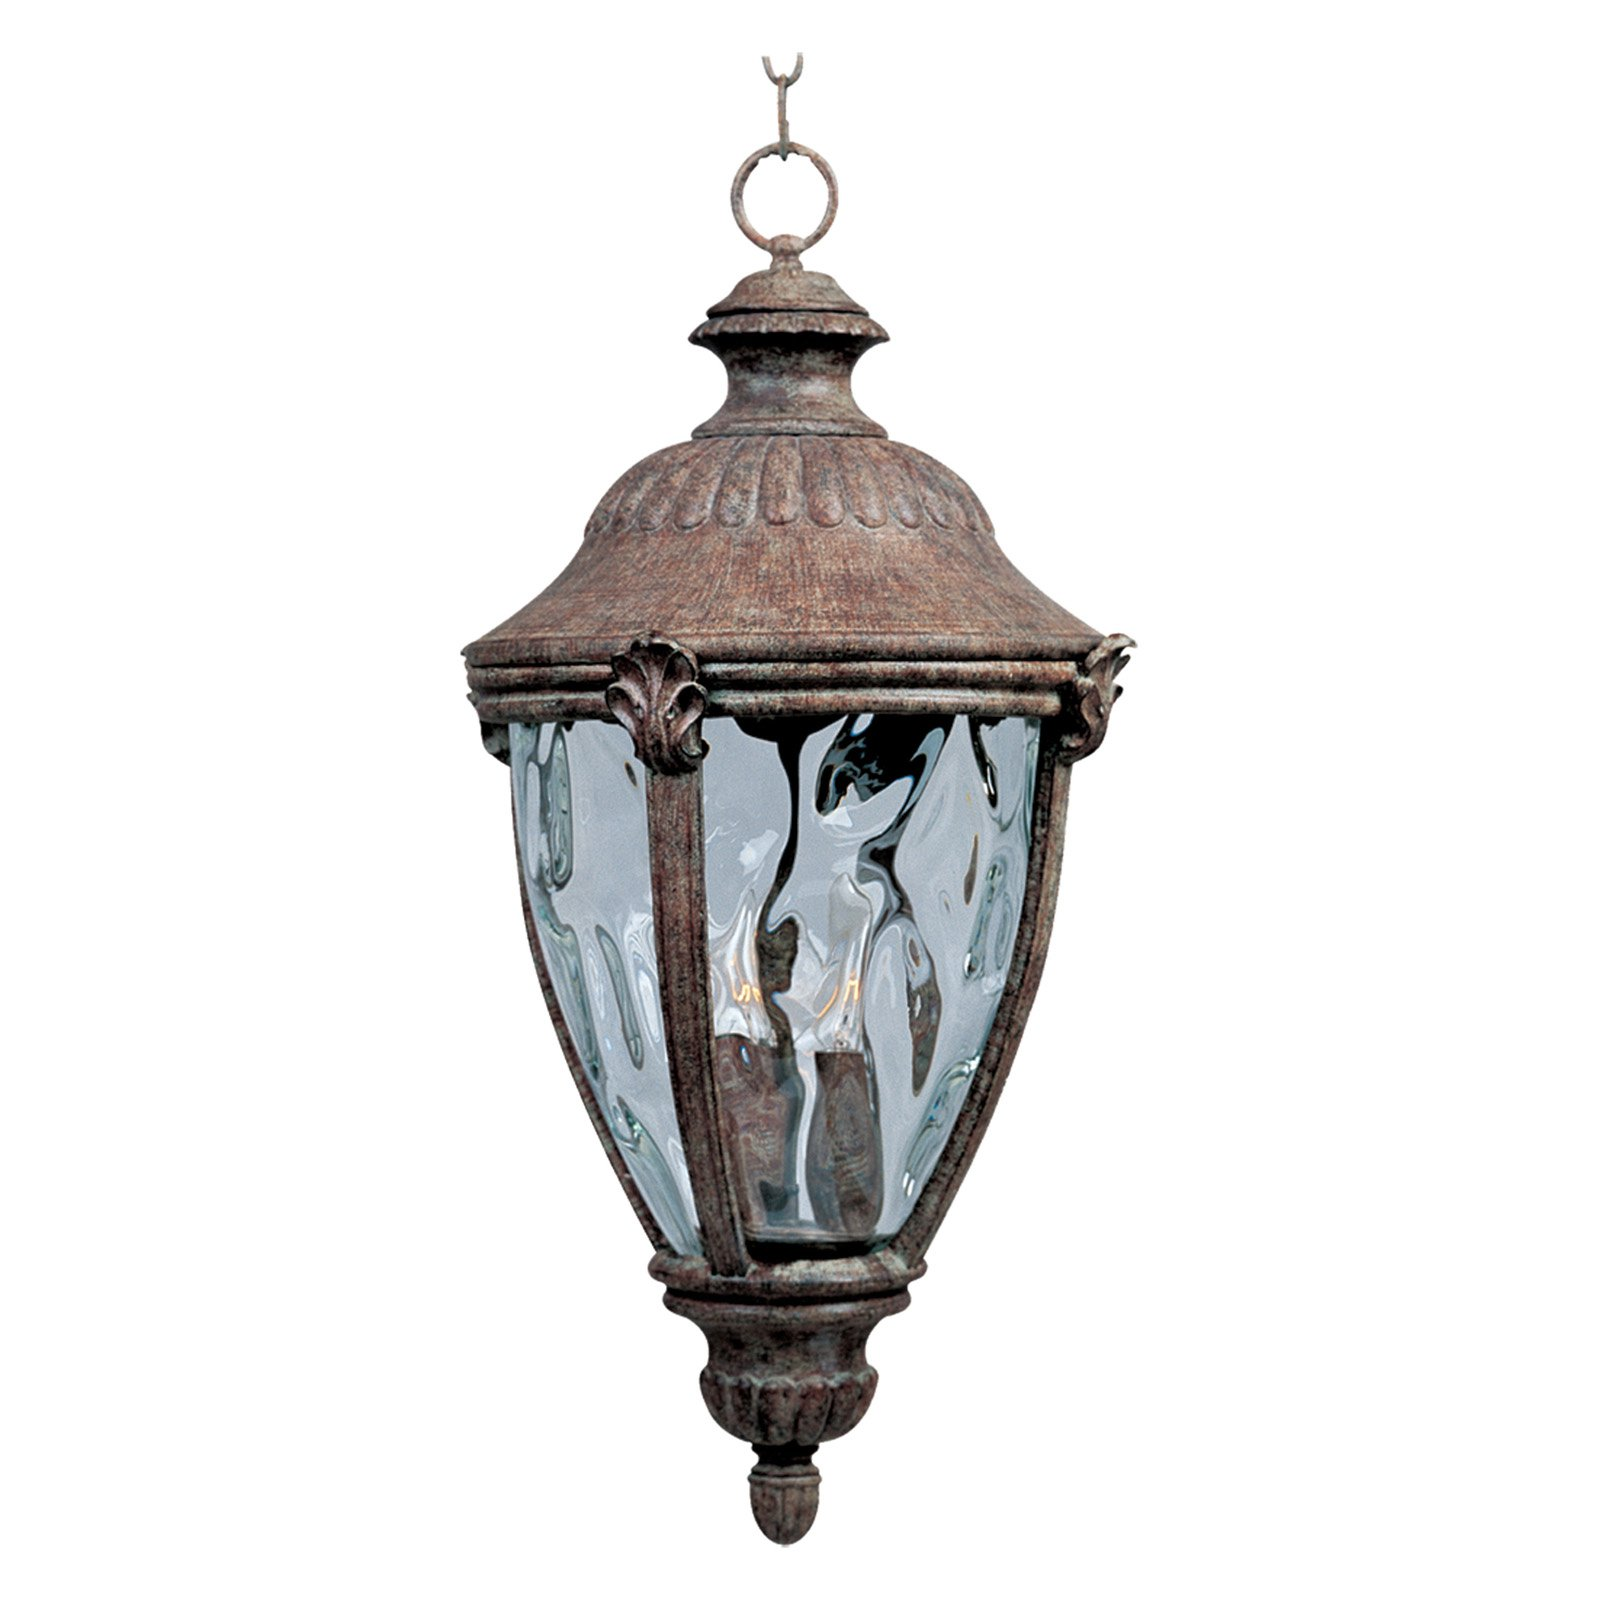 Maxim Morrow Bay DC Outdoor Hanging Lantern - 26H in. Earth Tone